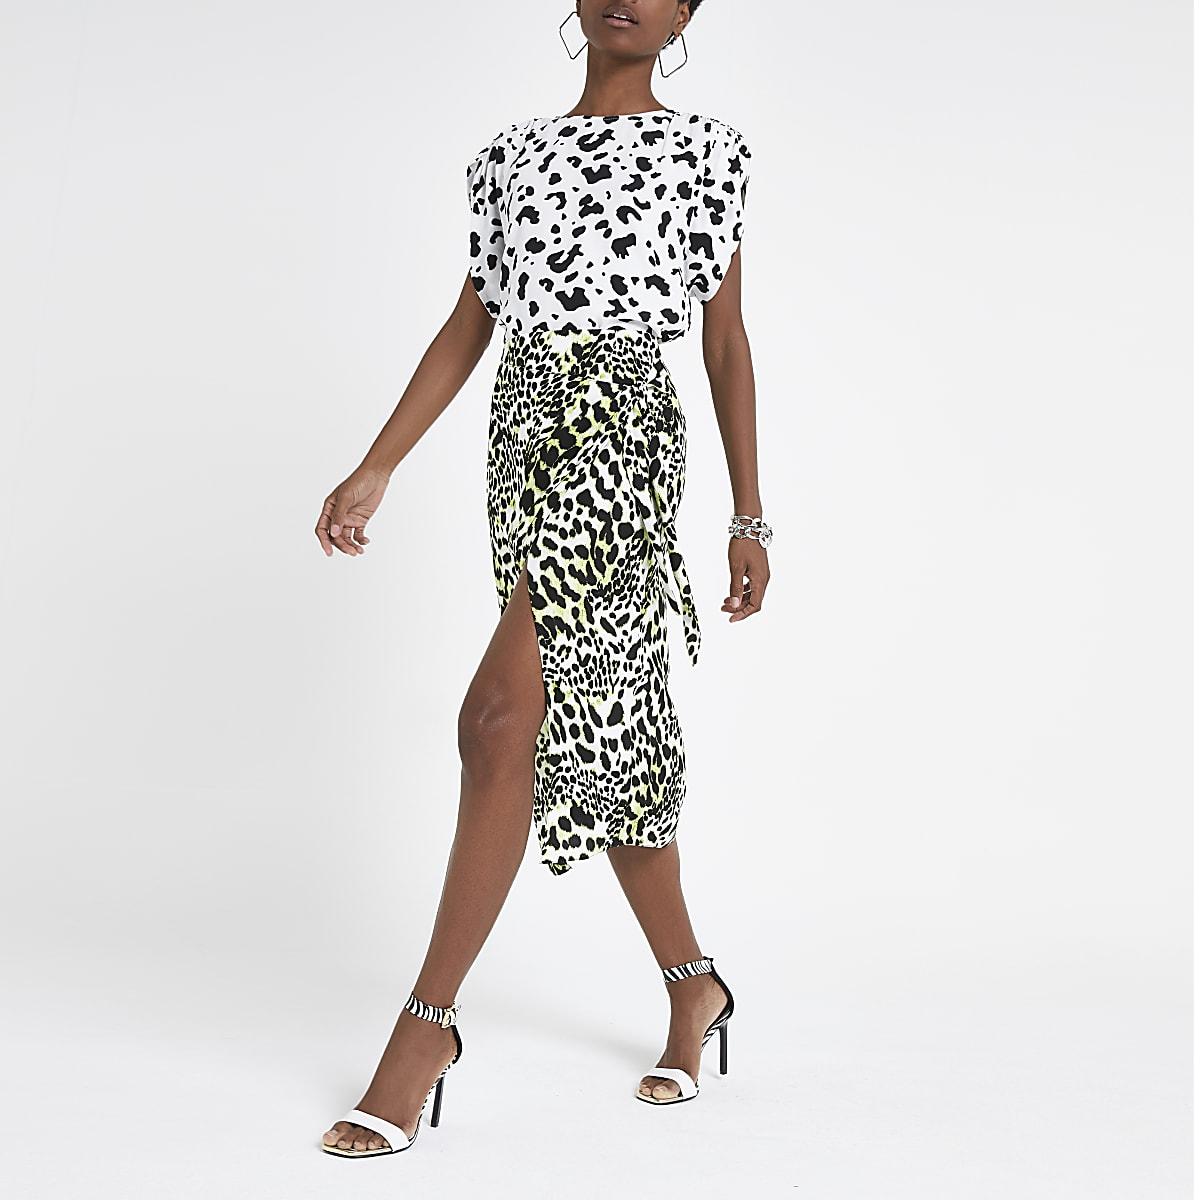 fbeb39b8f0cd White leopard print T-shirt - T-Shirts - Tops - women